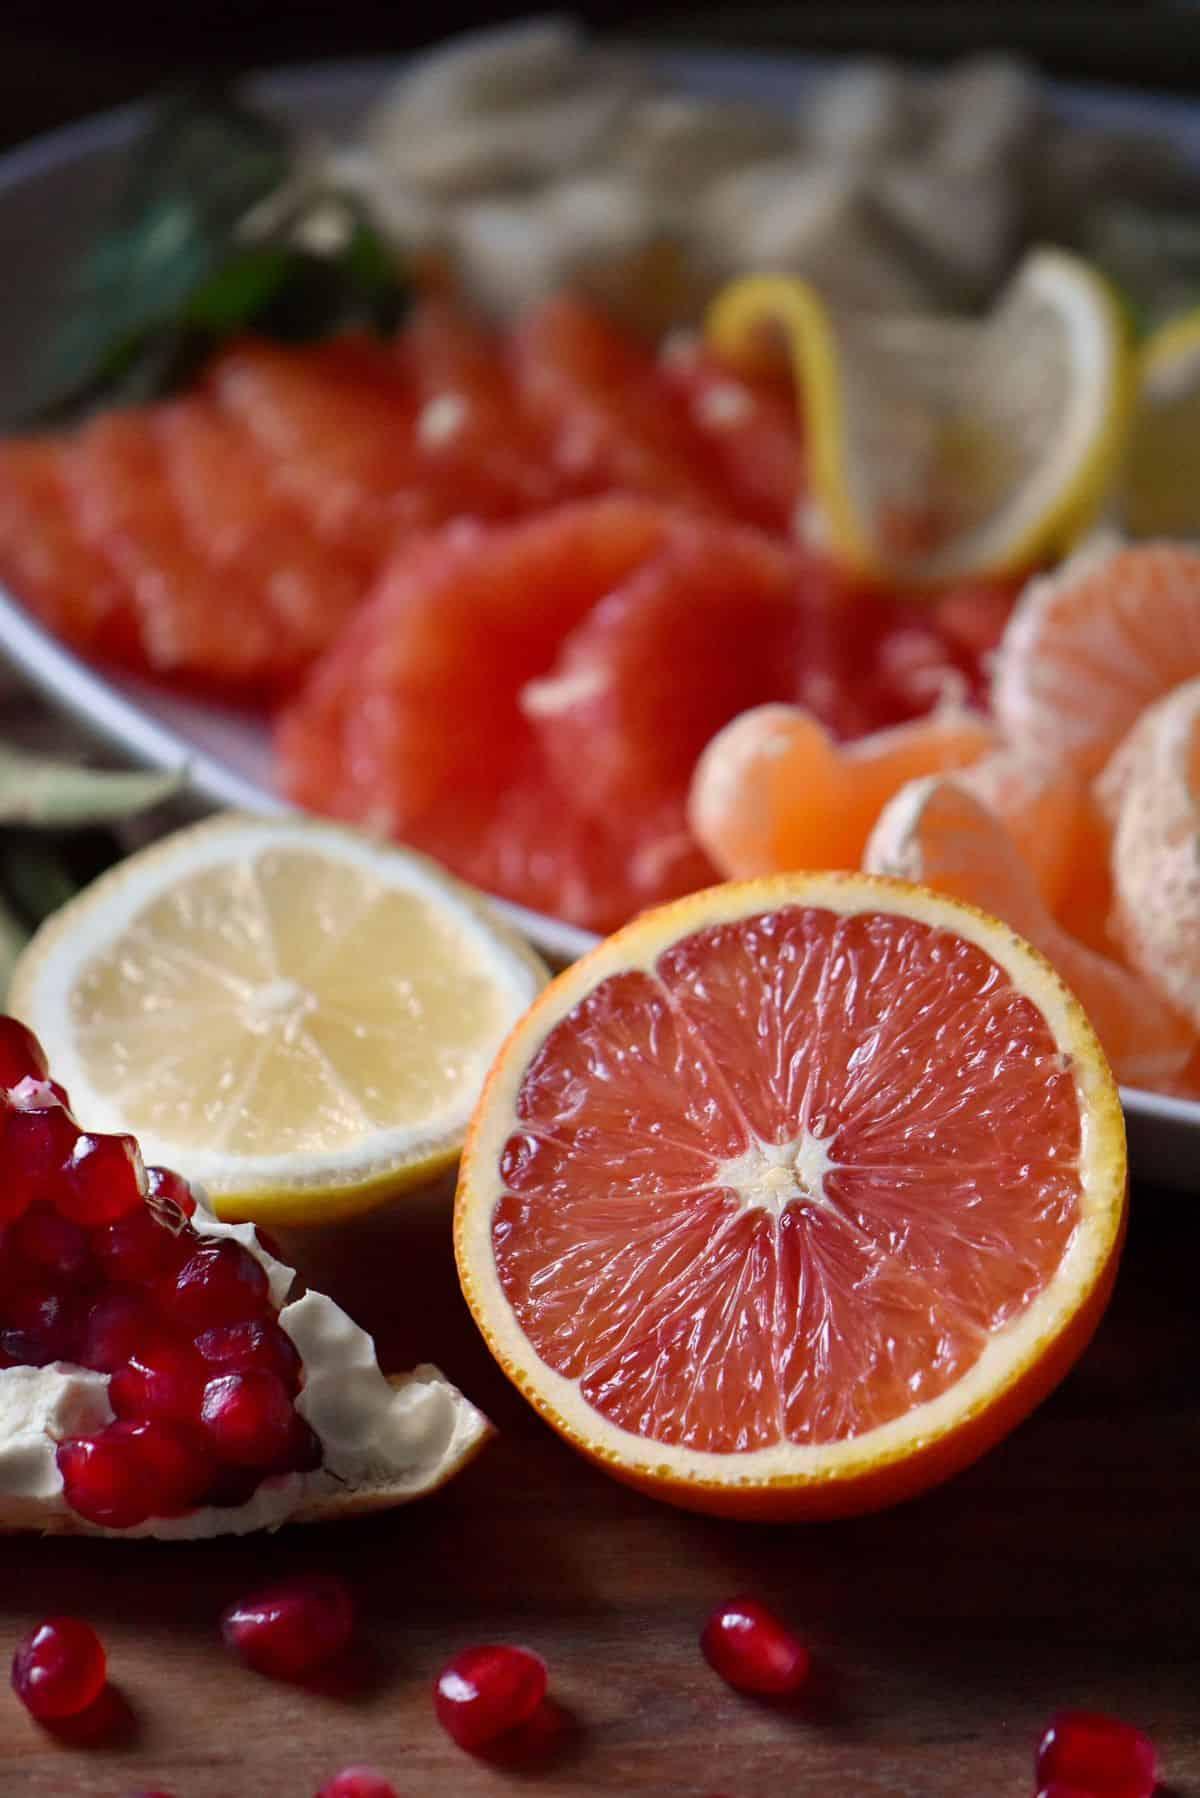 Cara Cara oranges, lemons and a pomegranate being prepared to make a winter fruit salad.